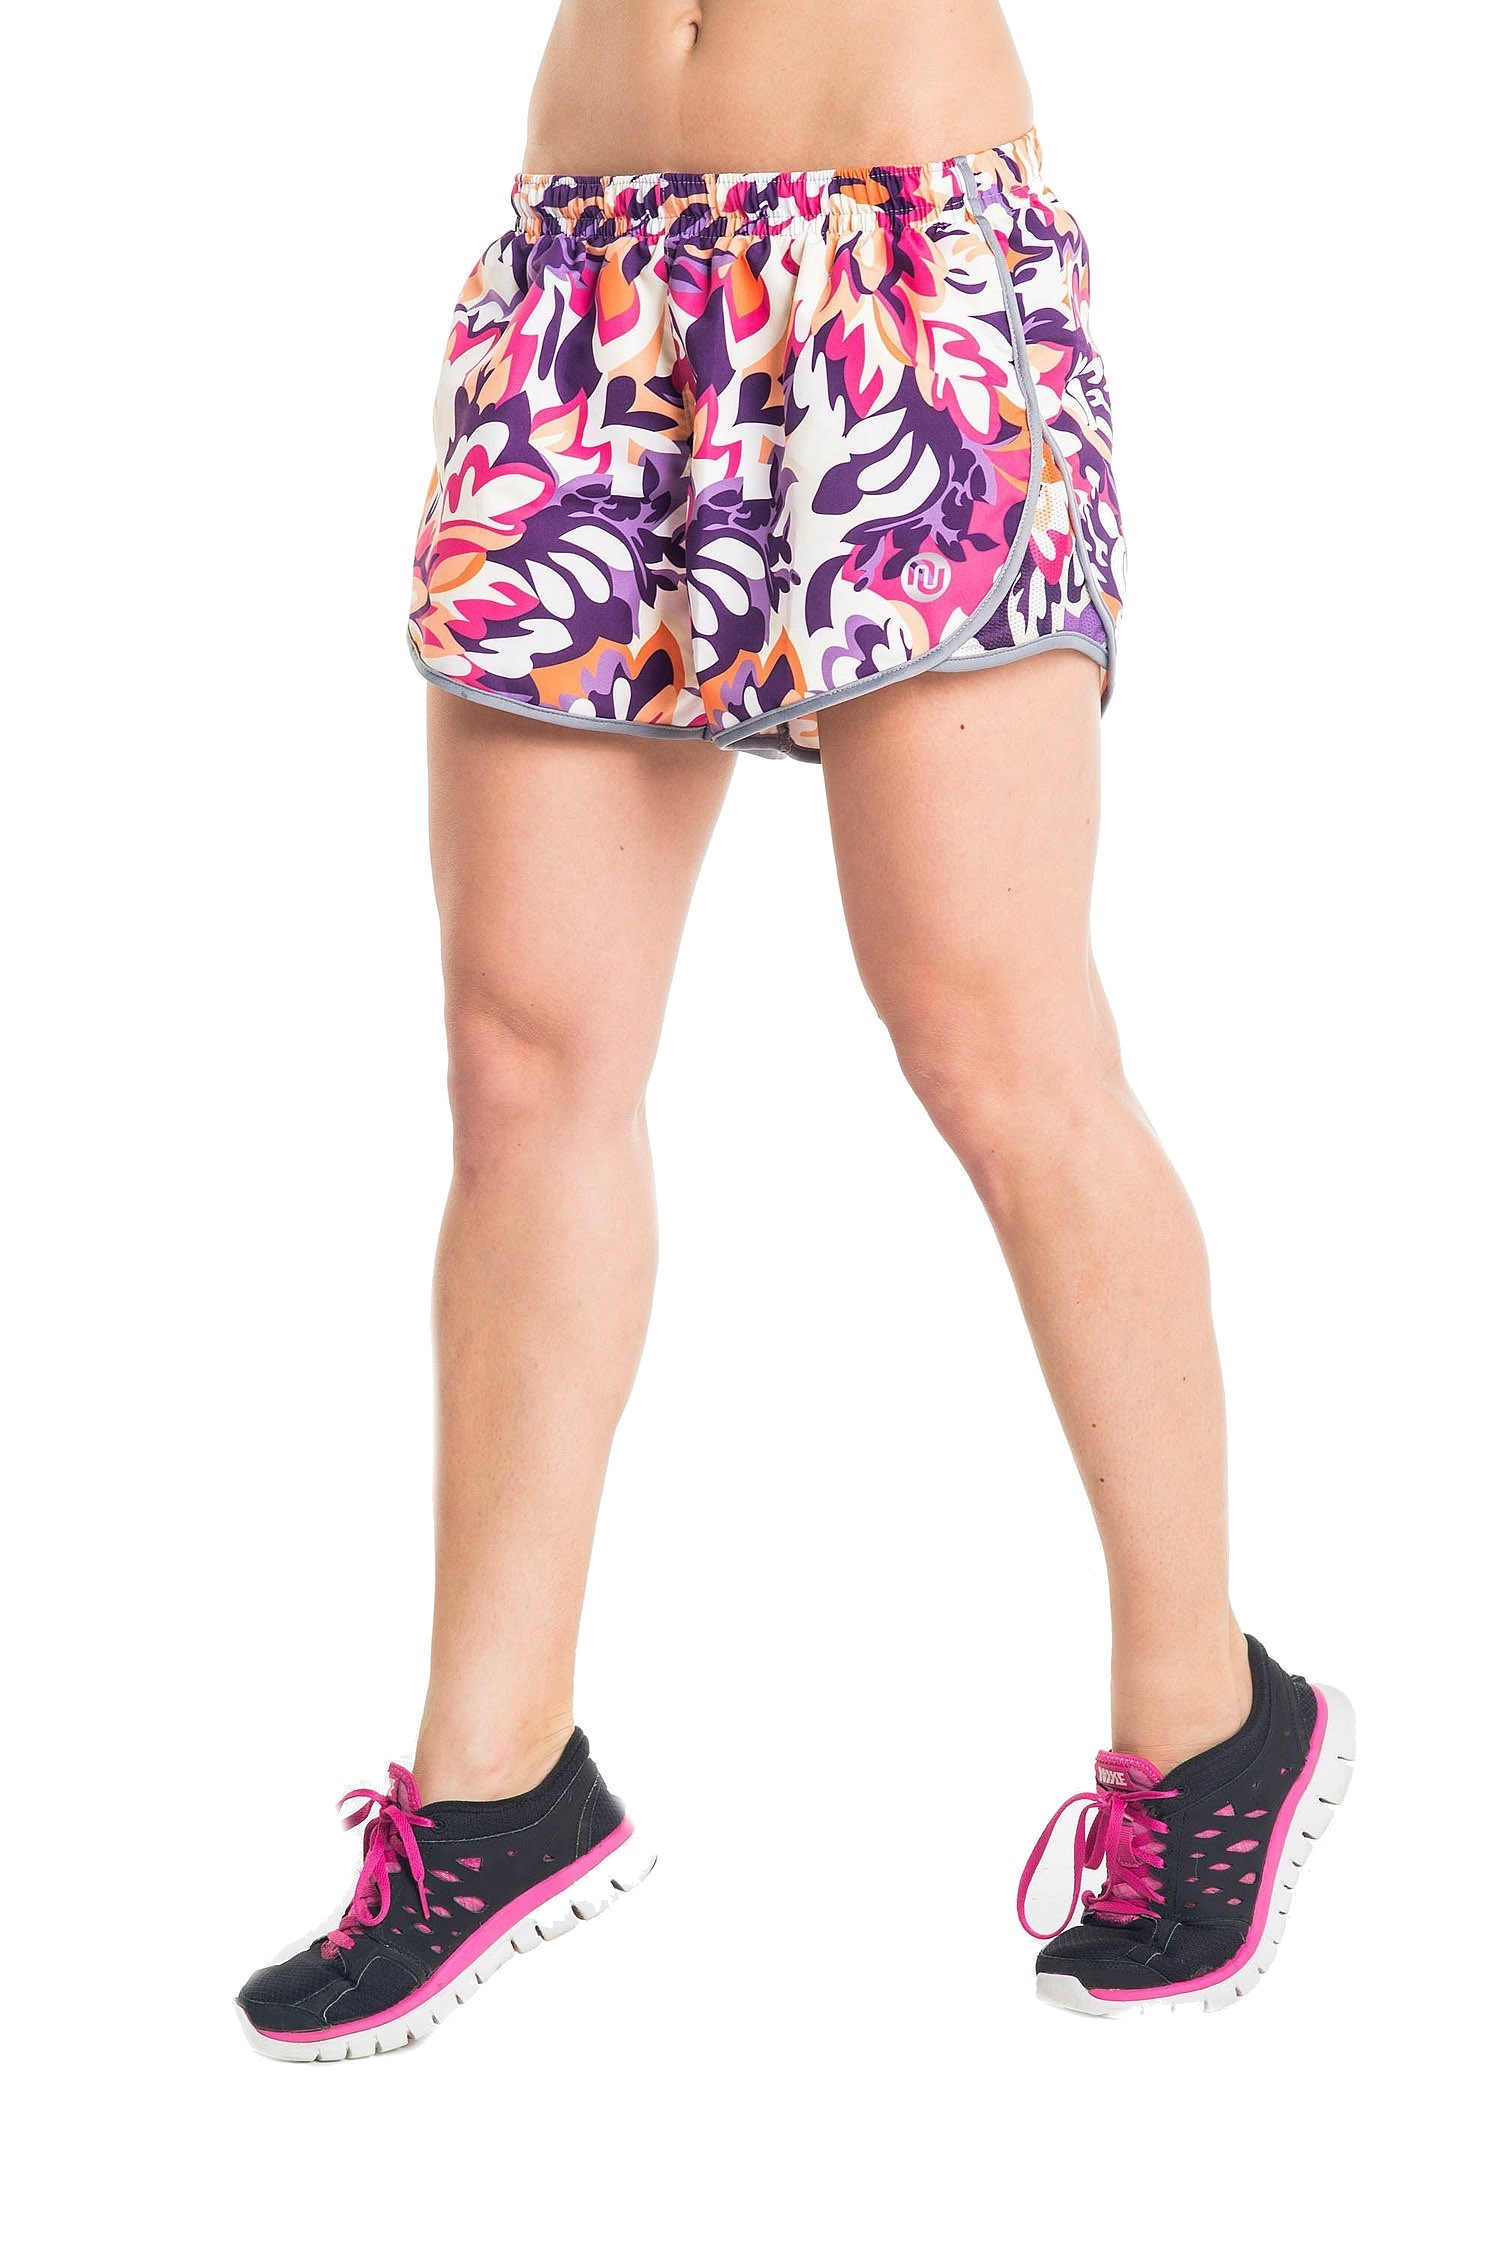 nessi damen shorts dsl kurze hose laufhose fitnesshose atmungsaktiv violet flowers prosske. Black Bedroom Furniture Sets. Home Design Ideas